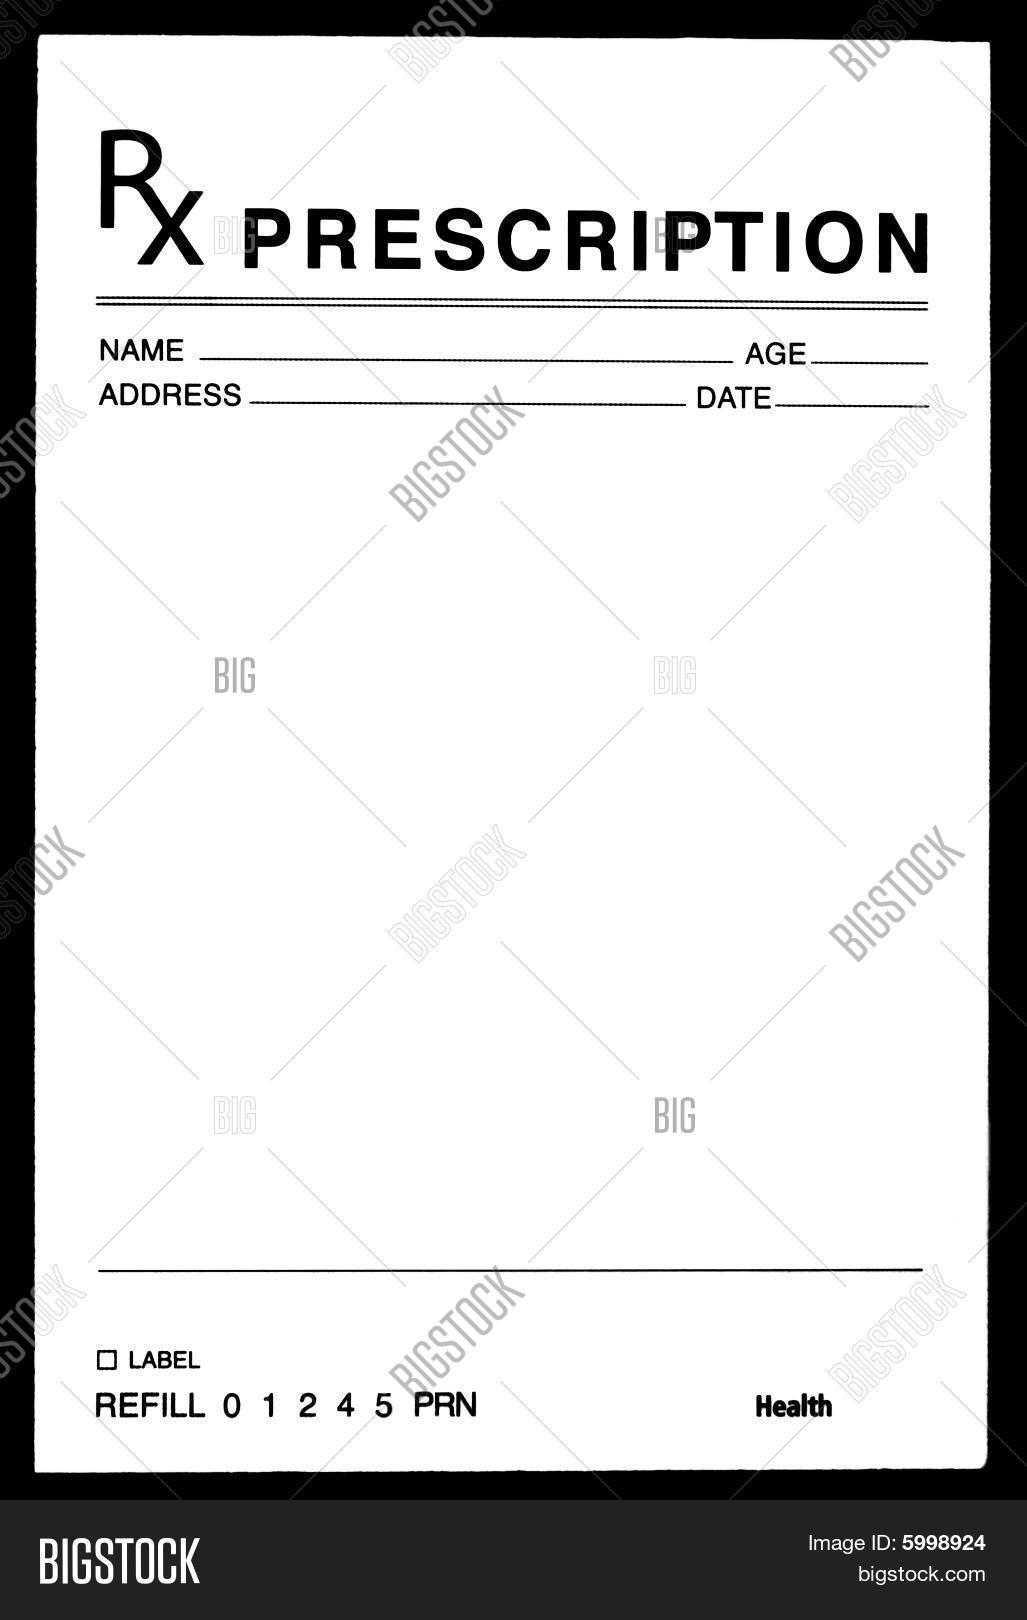 26 Images Of Blank Prescription Form Doctor Template Pertaining To Blank Prescription Form Template